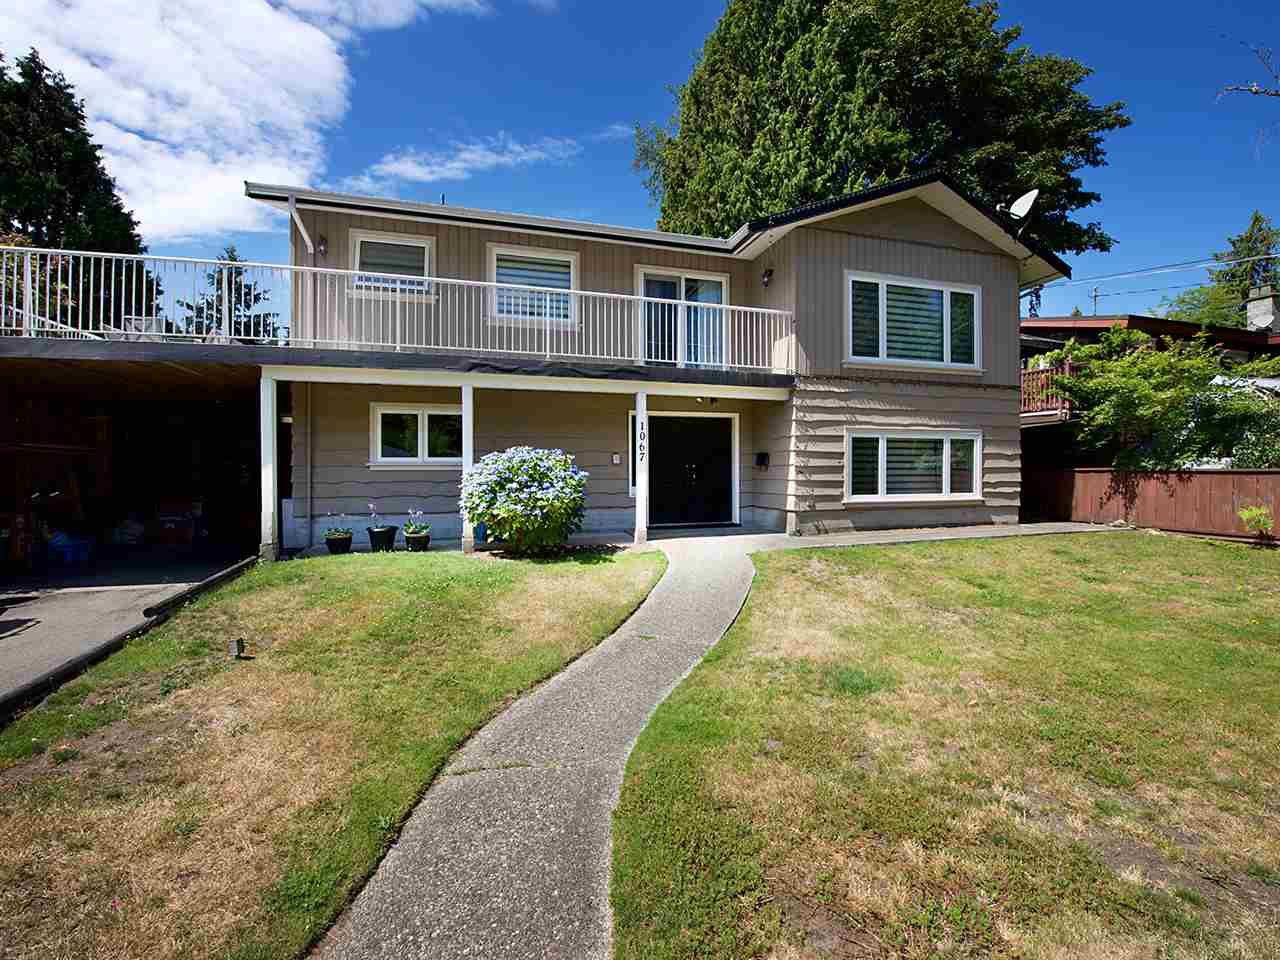 Photo 1: Photos: 1067 WILMINGTON Drive in Delta: Tsawwassen Central House for sale (Tsawwassen)  : MLS®# R2090180